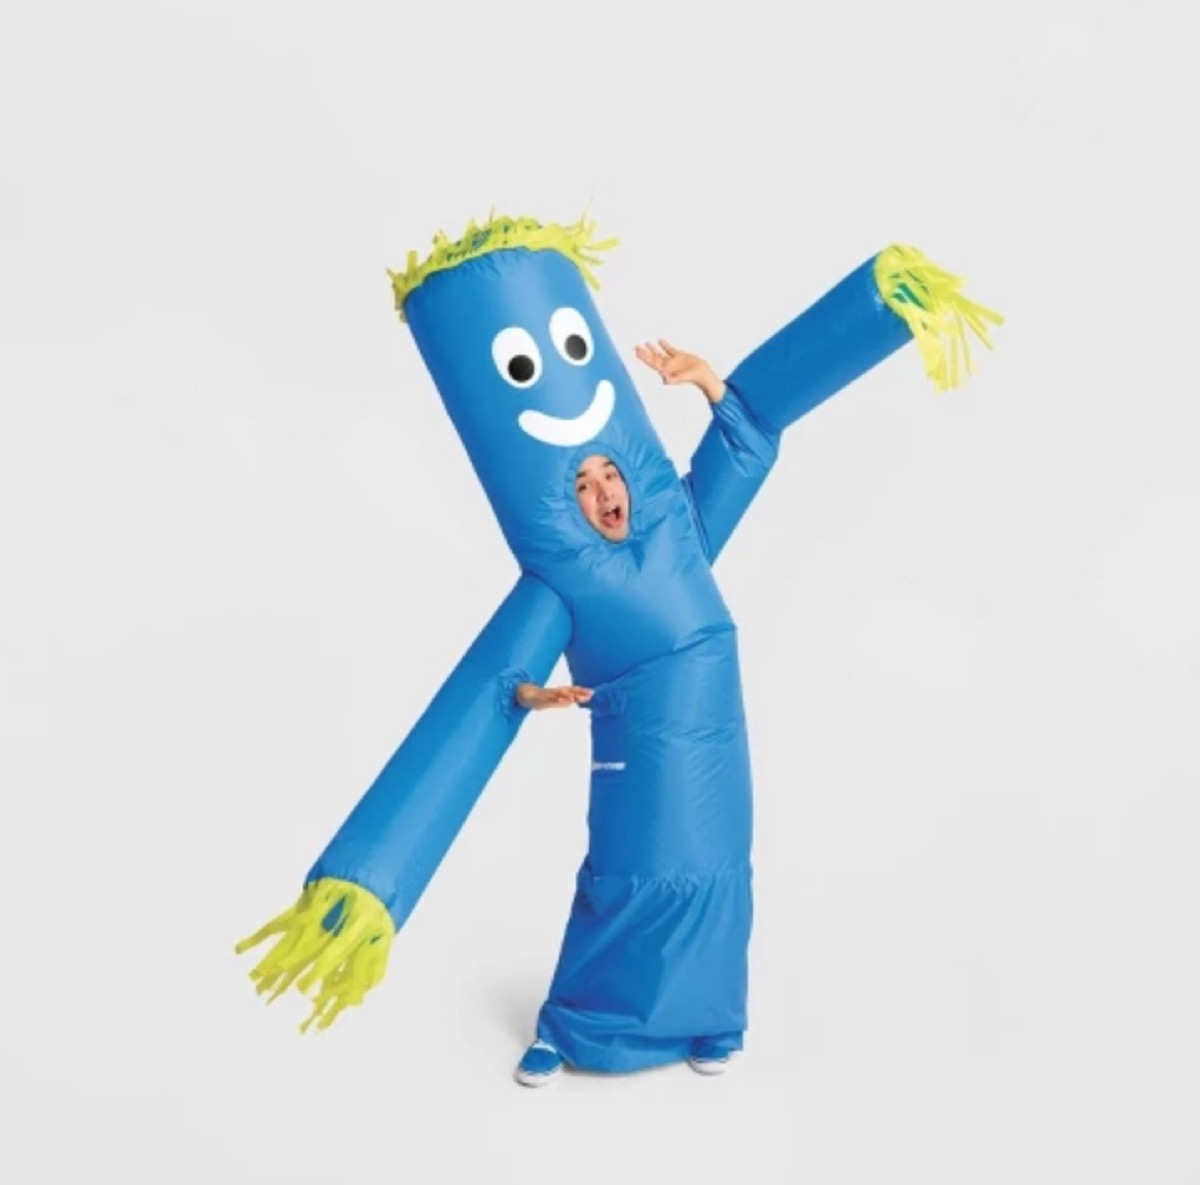 inflatable waving tube guy, best halloween costumes